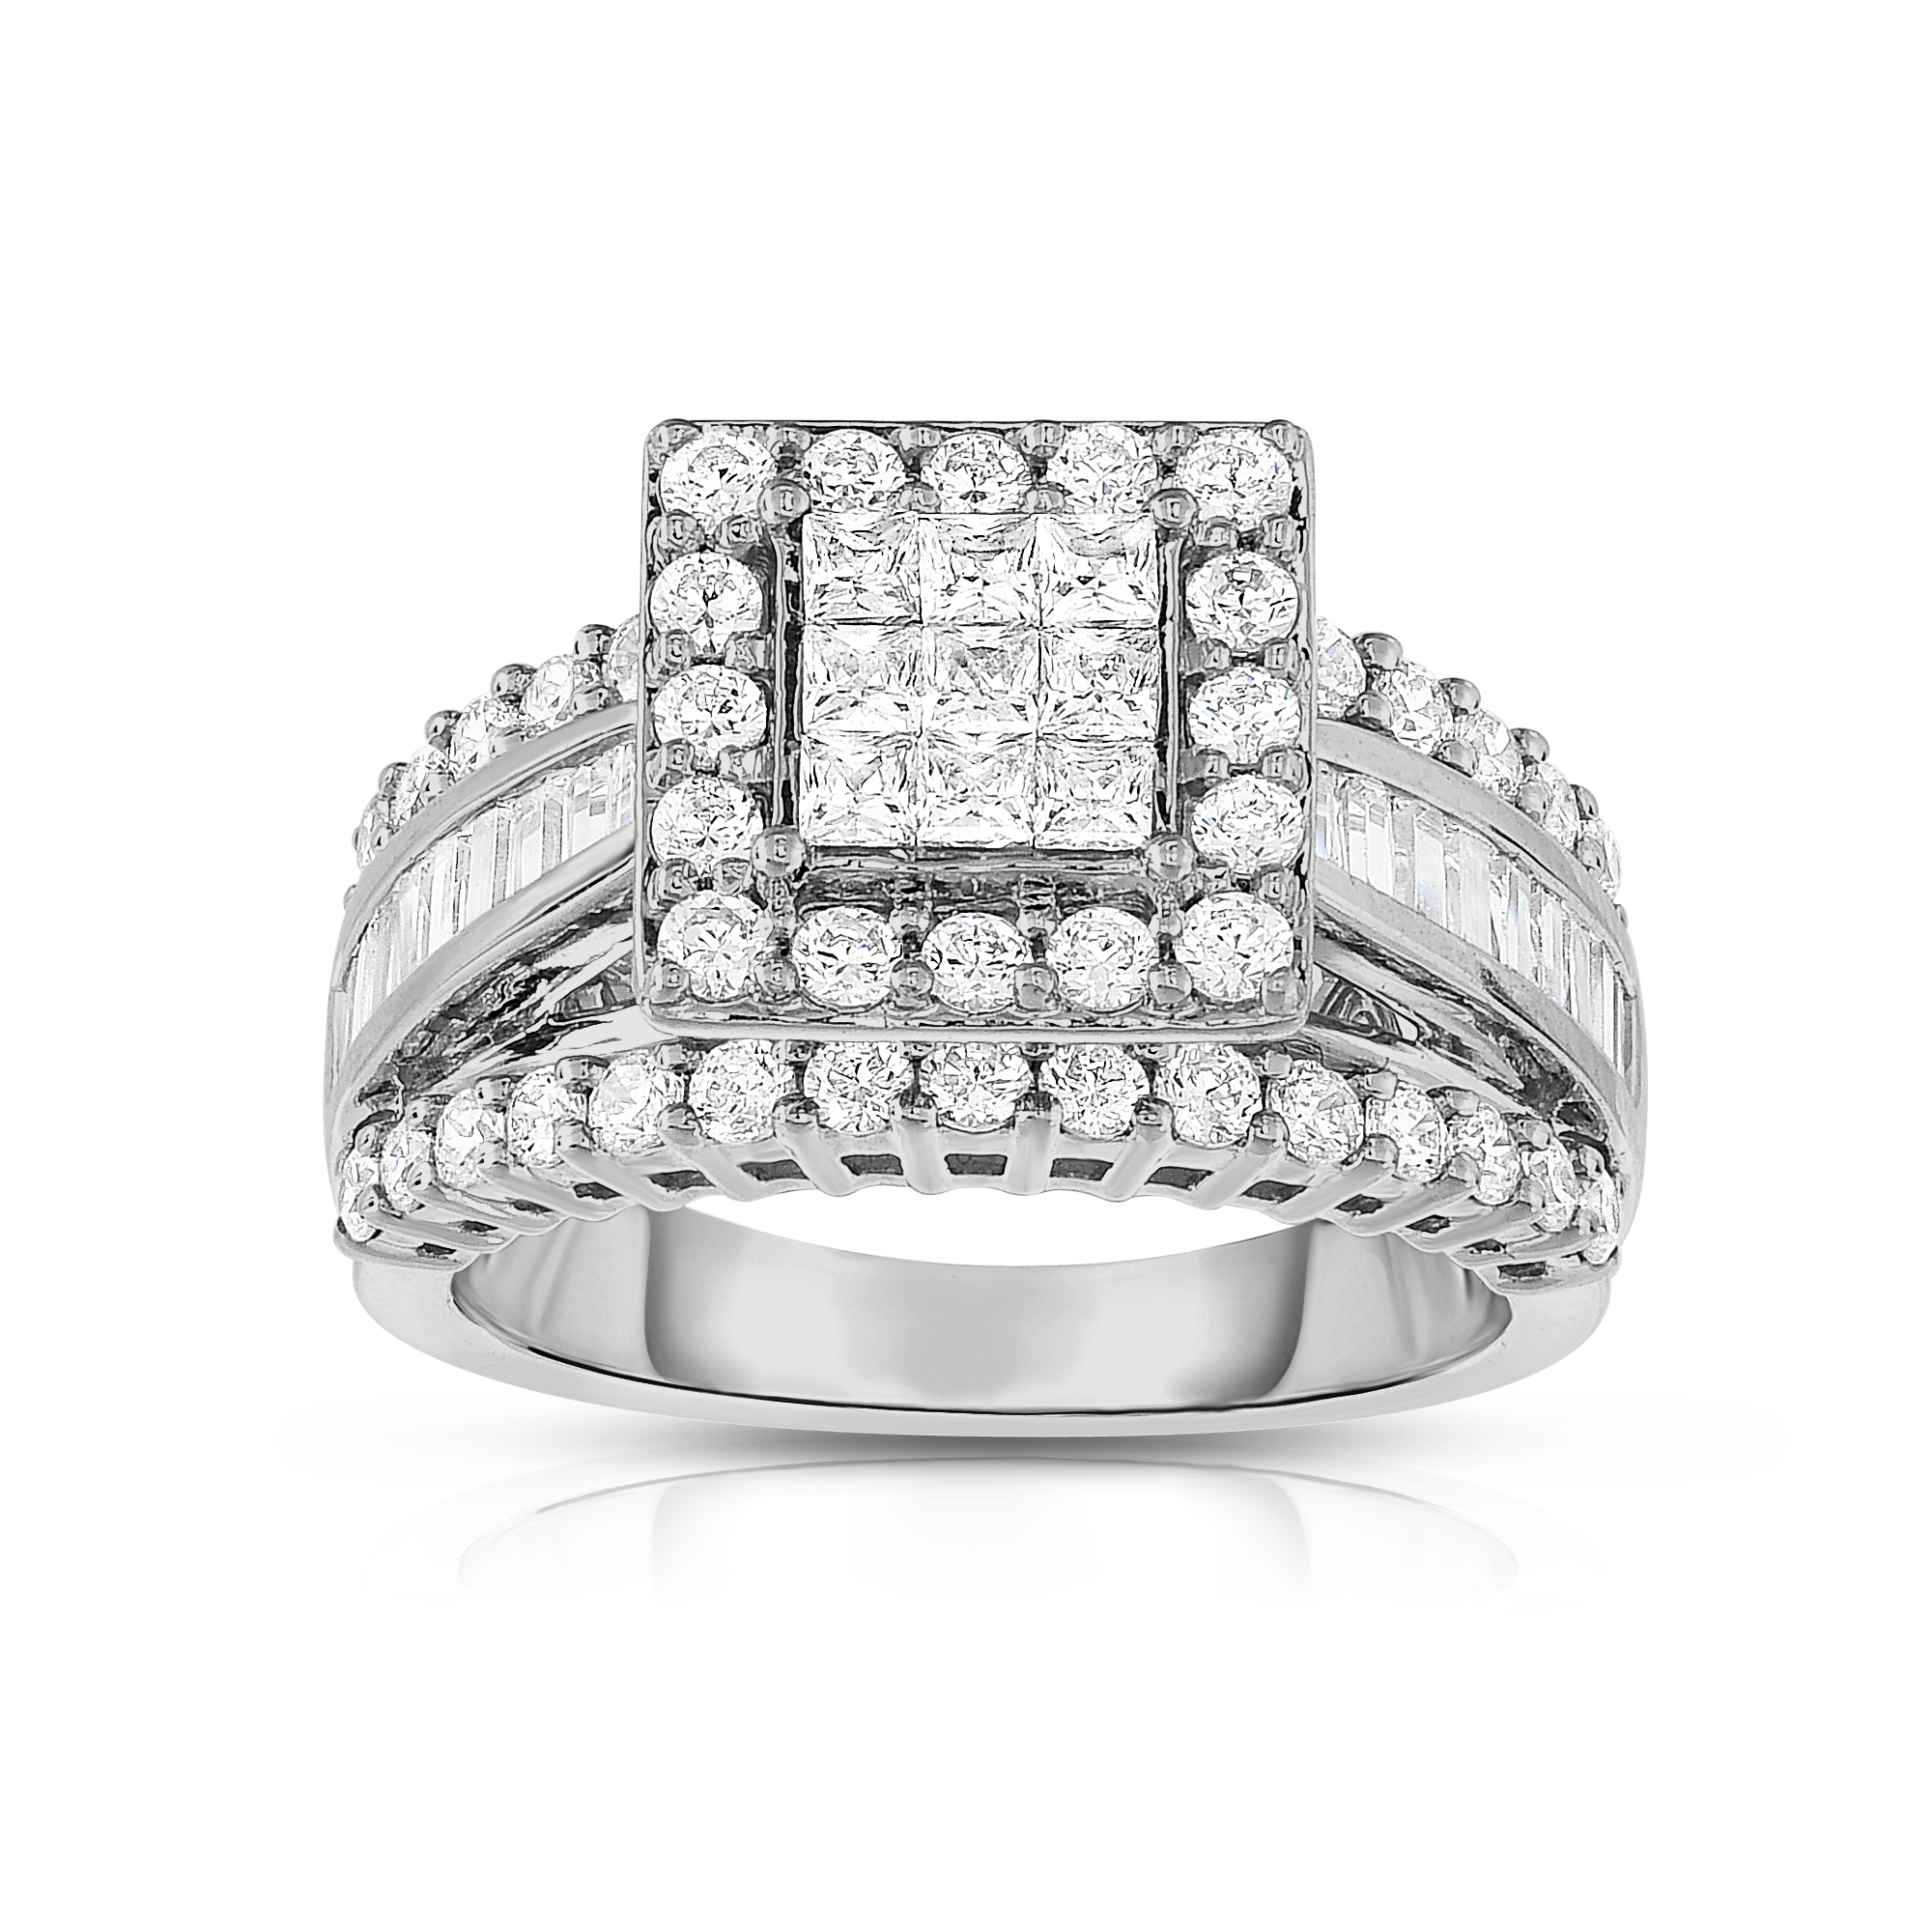 b square diamond wedding rings Square Cut 14K White Gold Diamond Engagement Ring